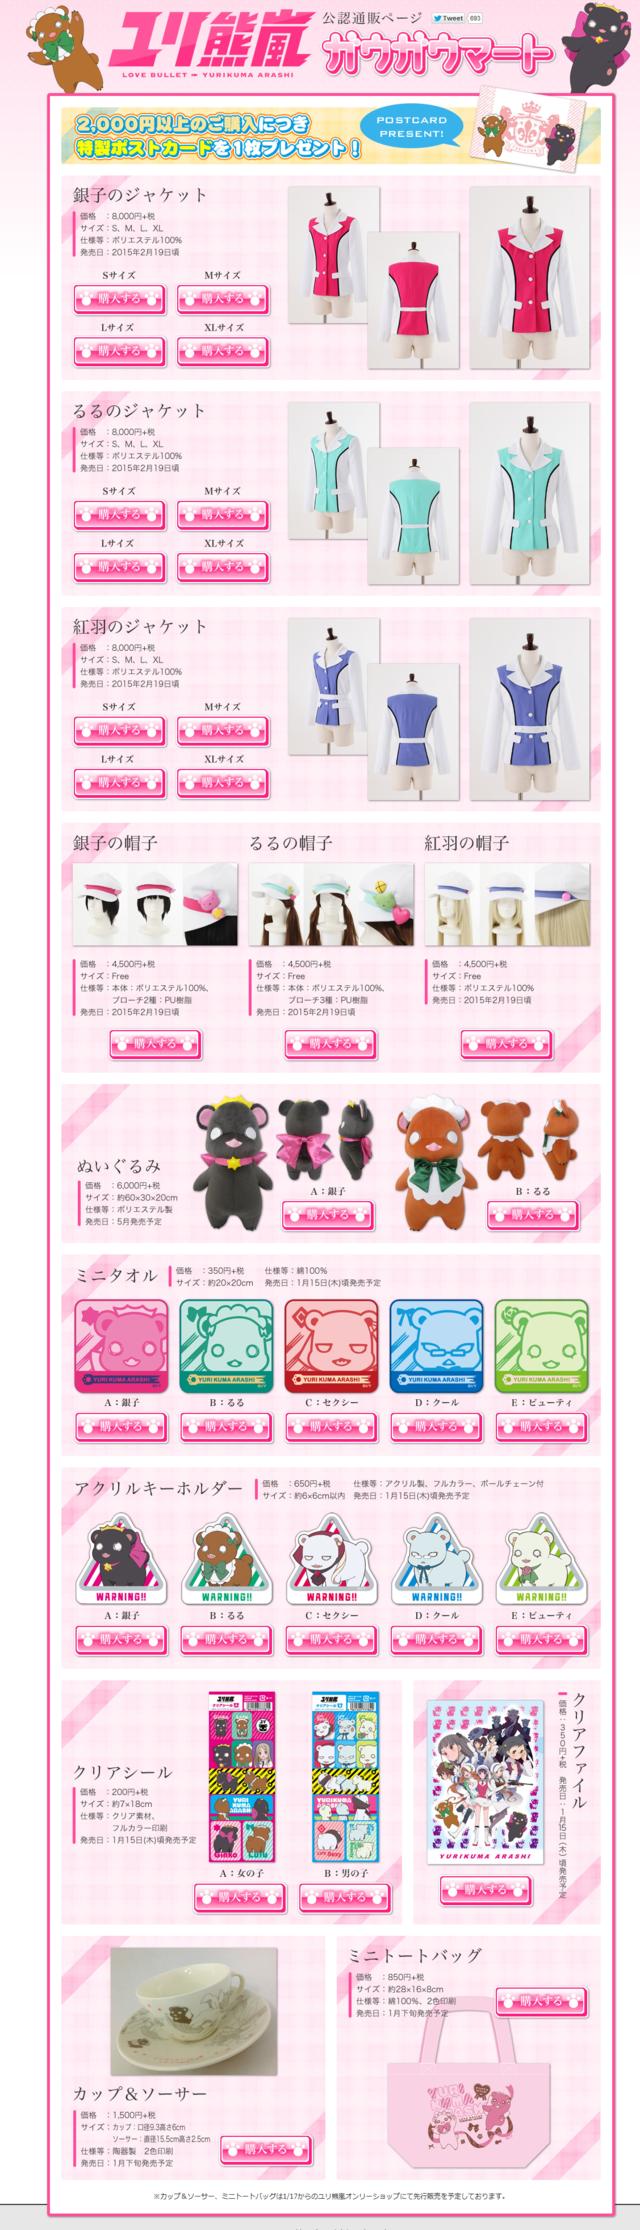 Yuri Kuma Arashi and Grisaia No Kajitsu Hug Pillows Go on Sale haruhichan.com Movic Goods